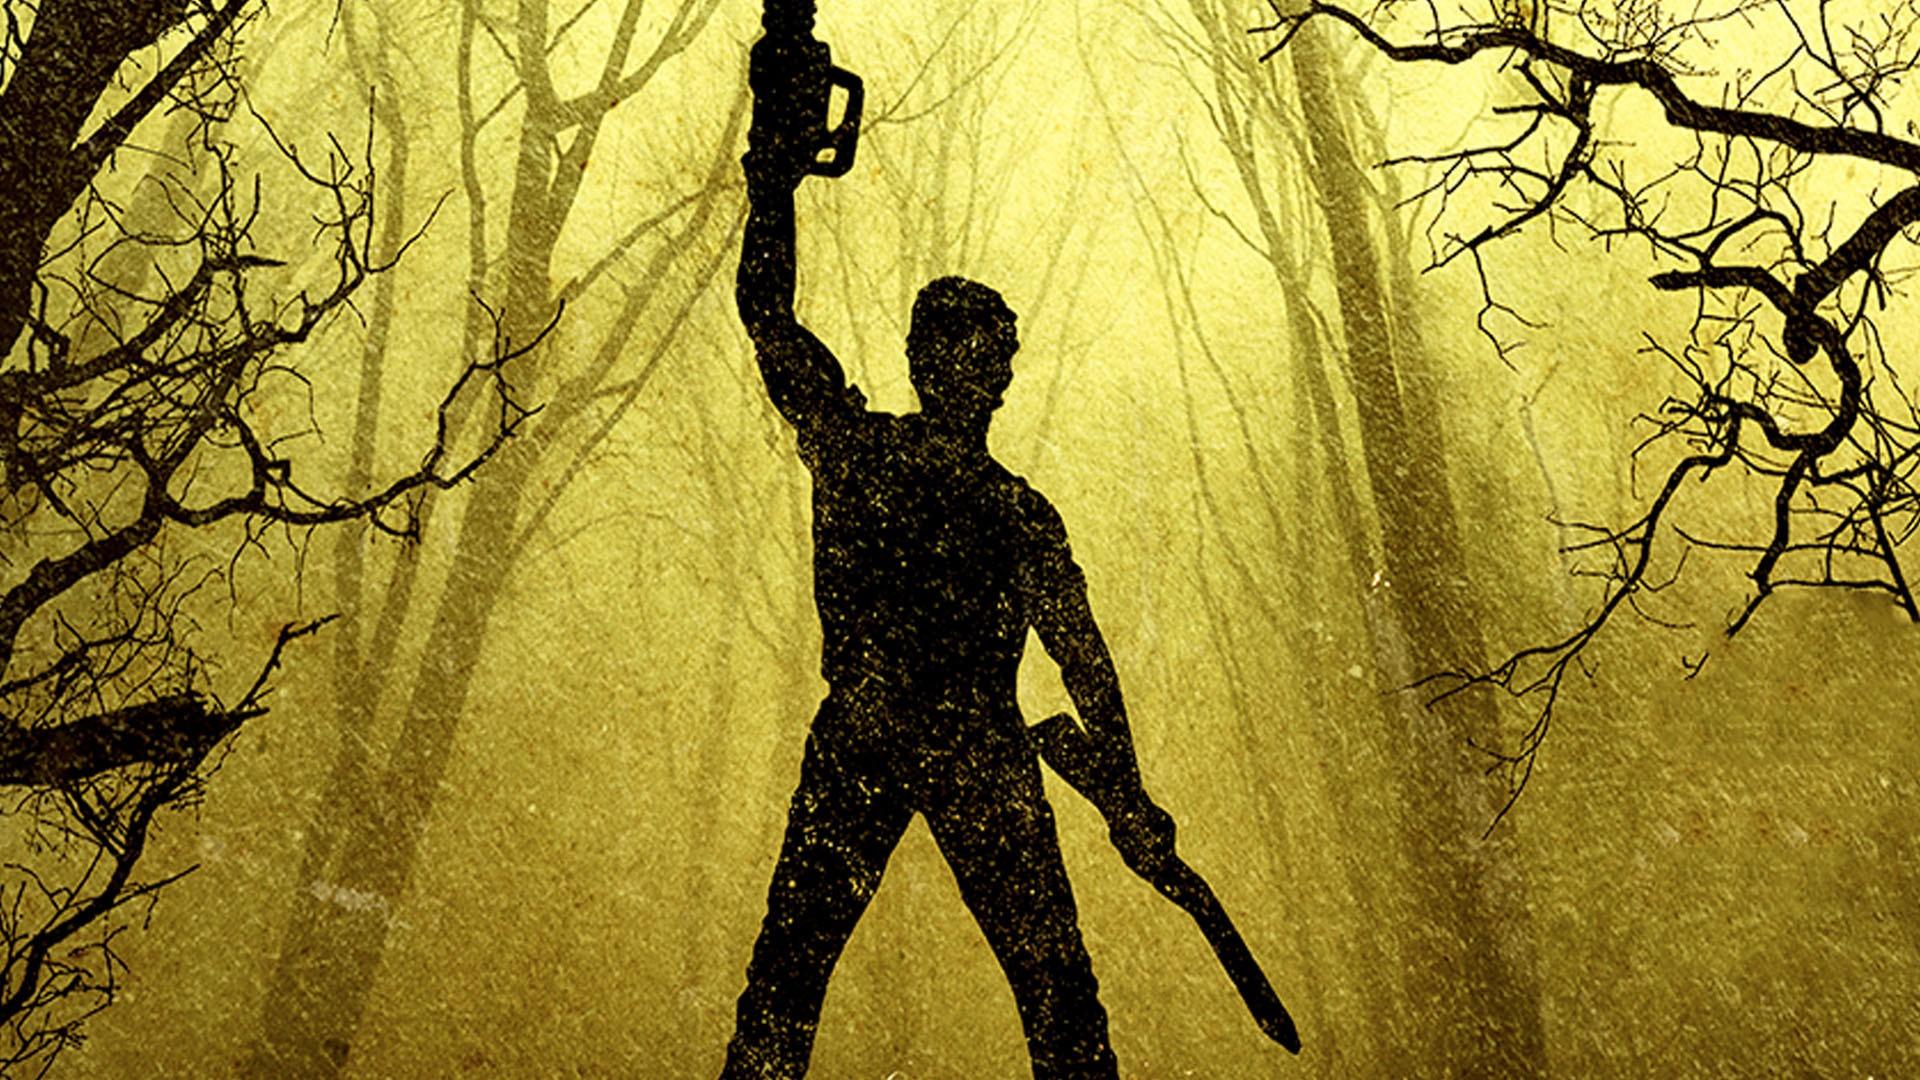 Free Download Ash Vs Evil Dead Wallpaper 1920x1080 For Your